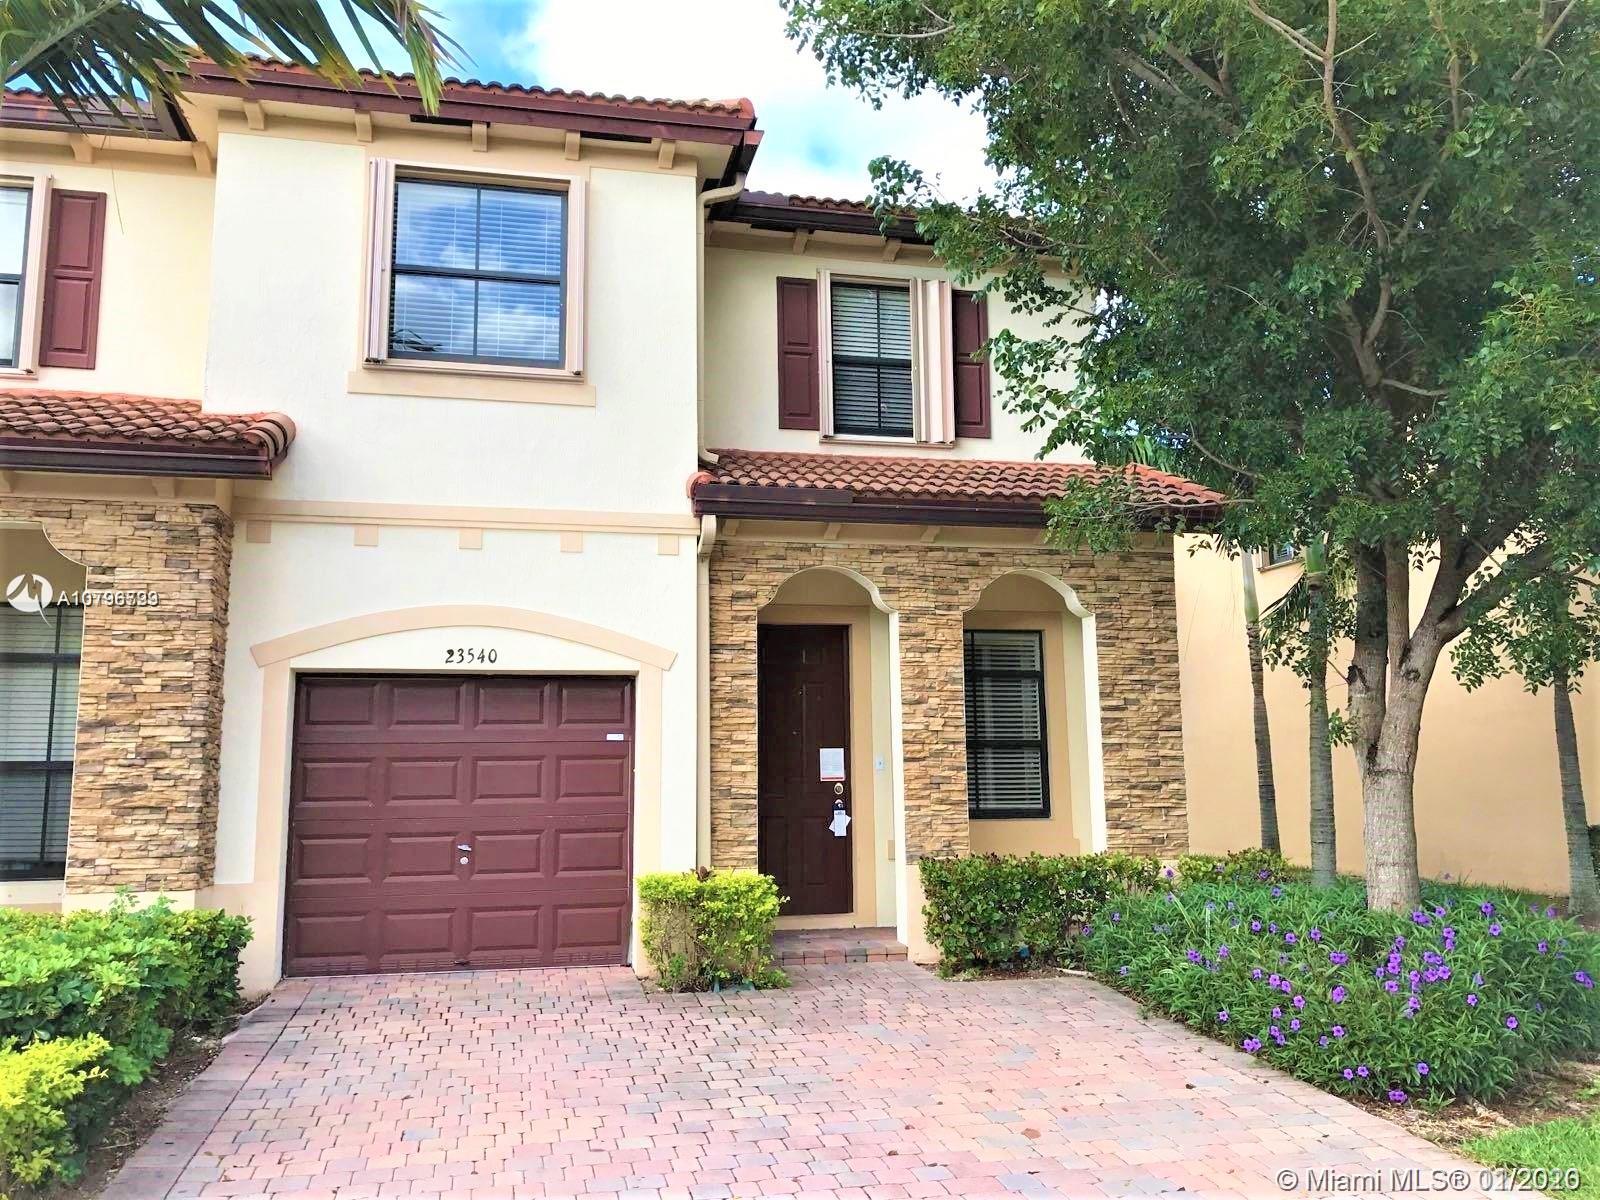 23540 SW 113th Ave #0, Homestead, FL 33032 - Homestead, FL real estate listing